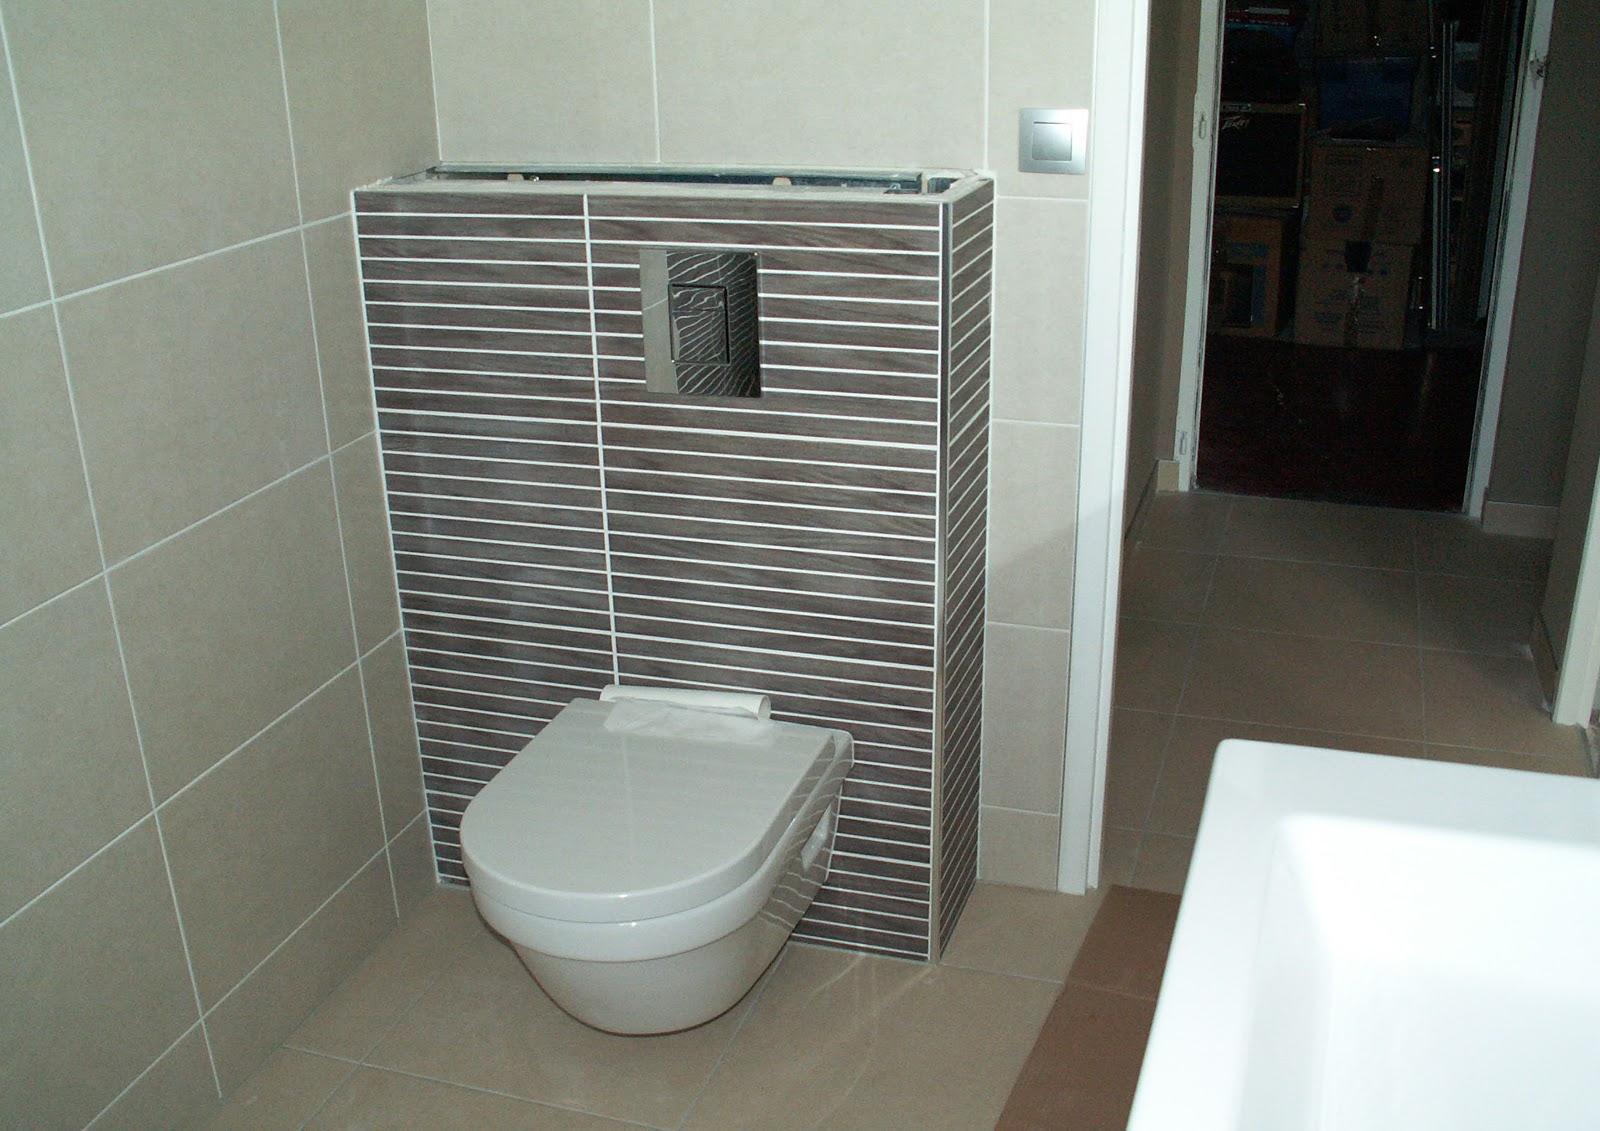 Stop carrelage arnas demande de devis travaux versailles for Nettoyage carrelage salle de bain